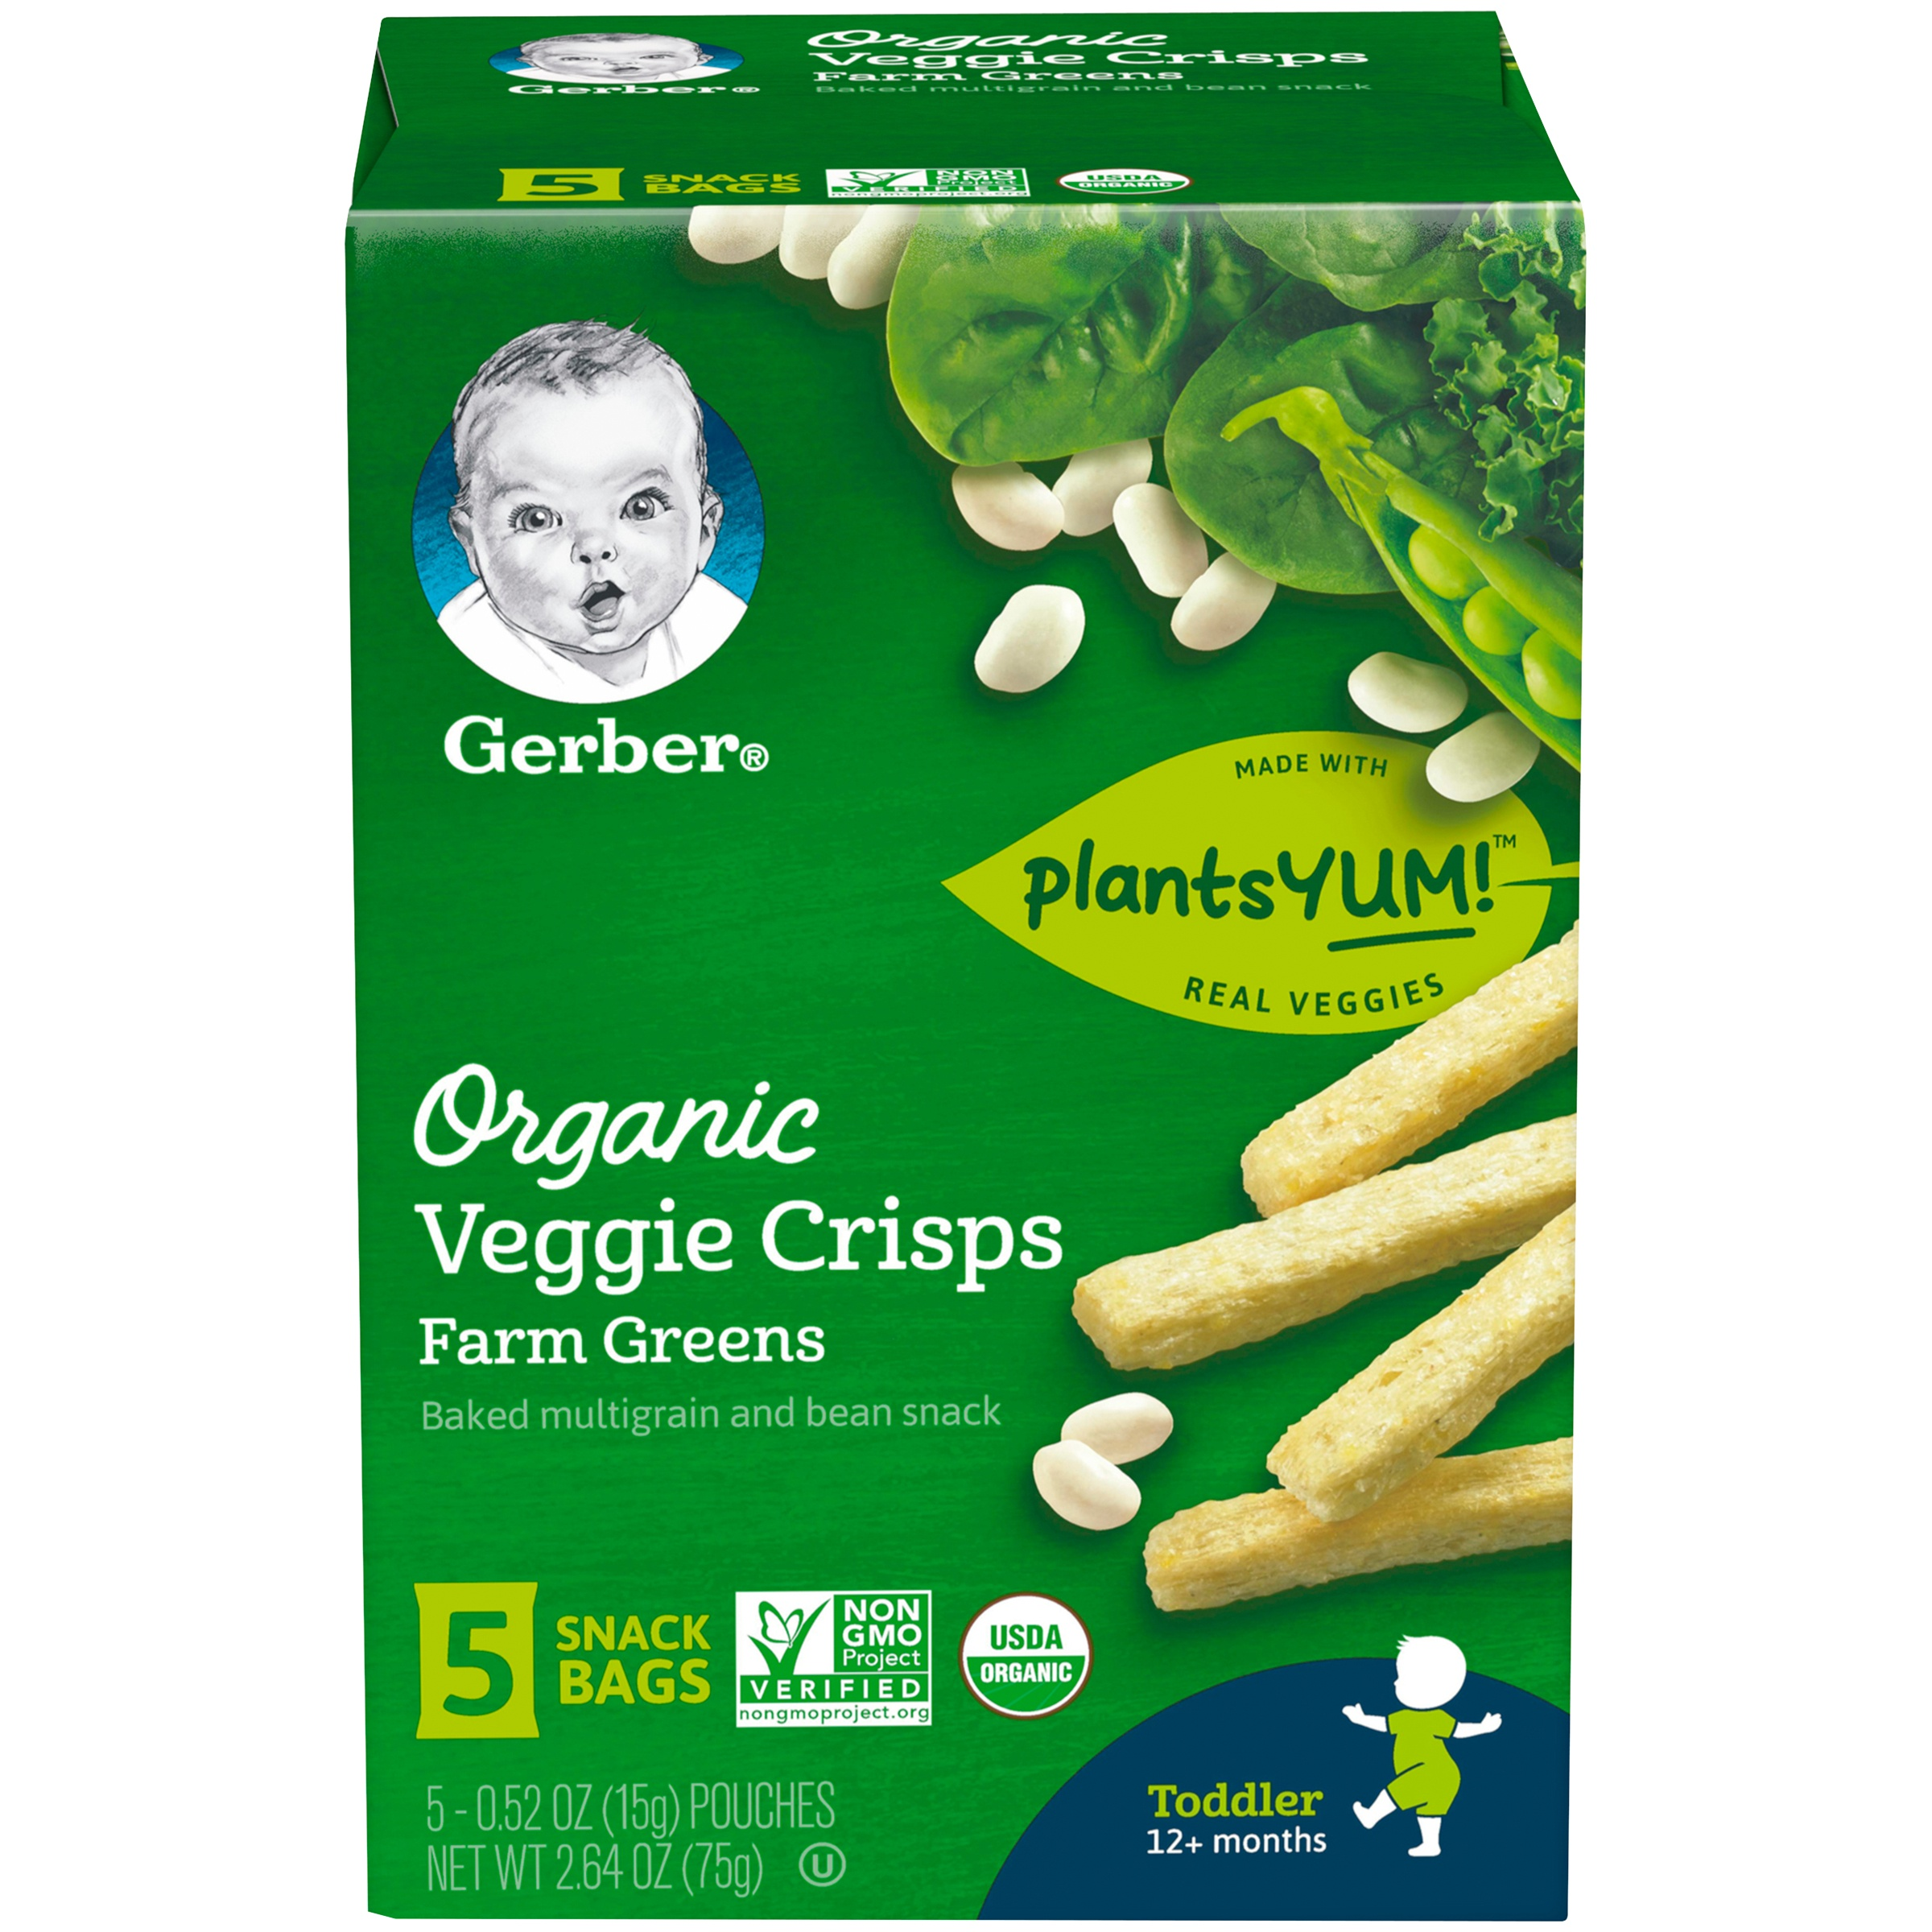 Gerber Organic Veggie Crisps, Farm Greens, 0.52 oz. Pouch, 5 Count (Pack of 4)